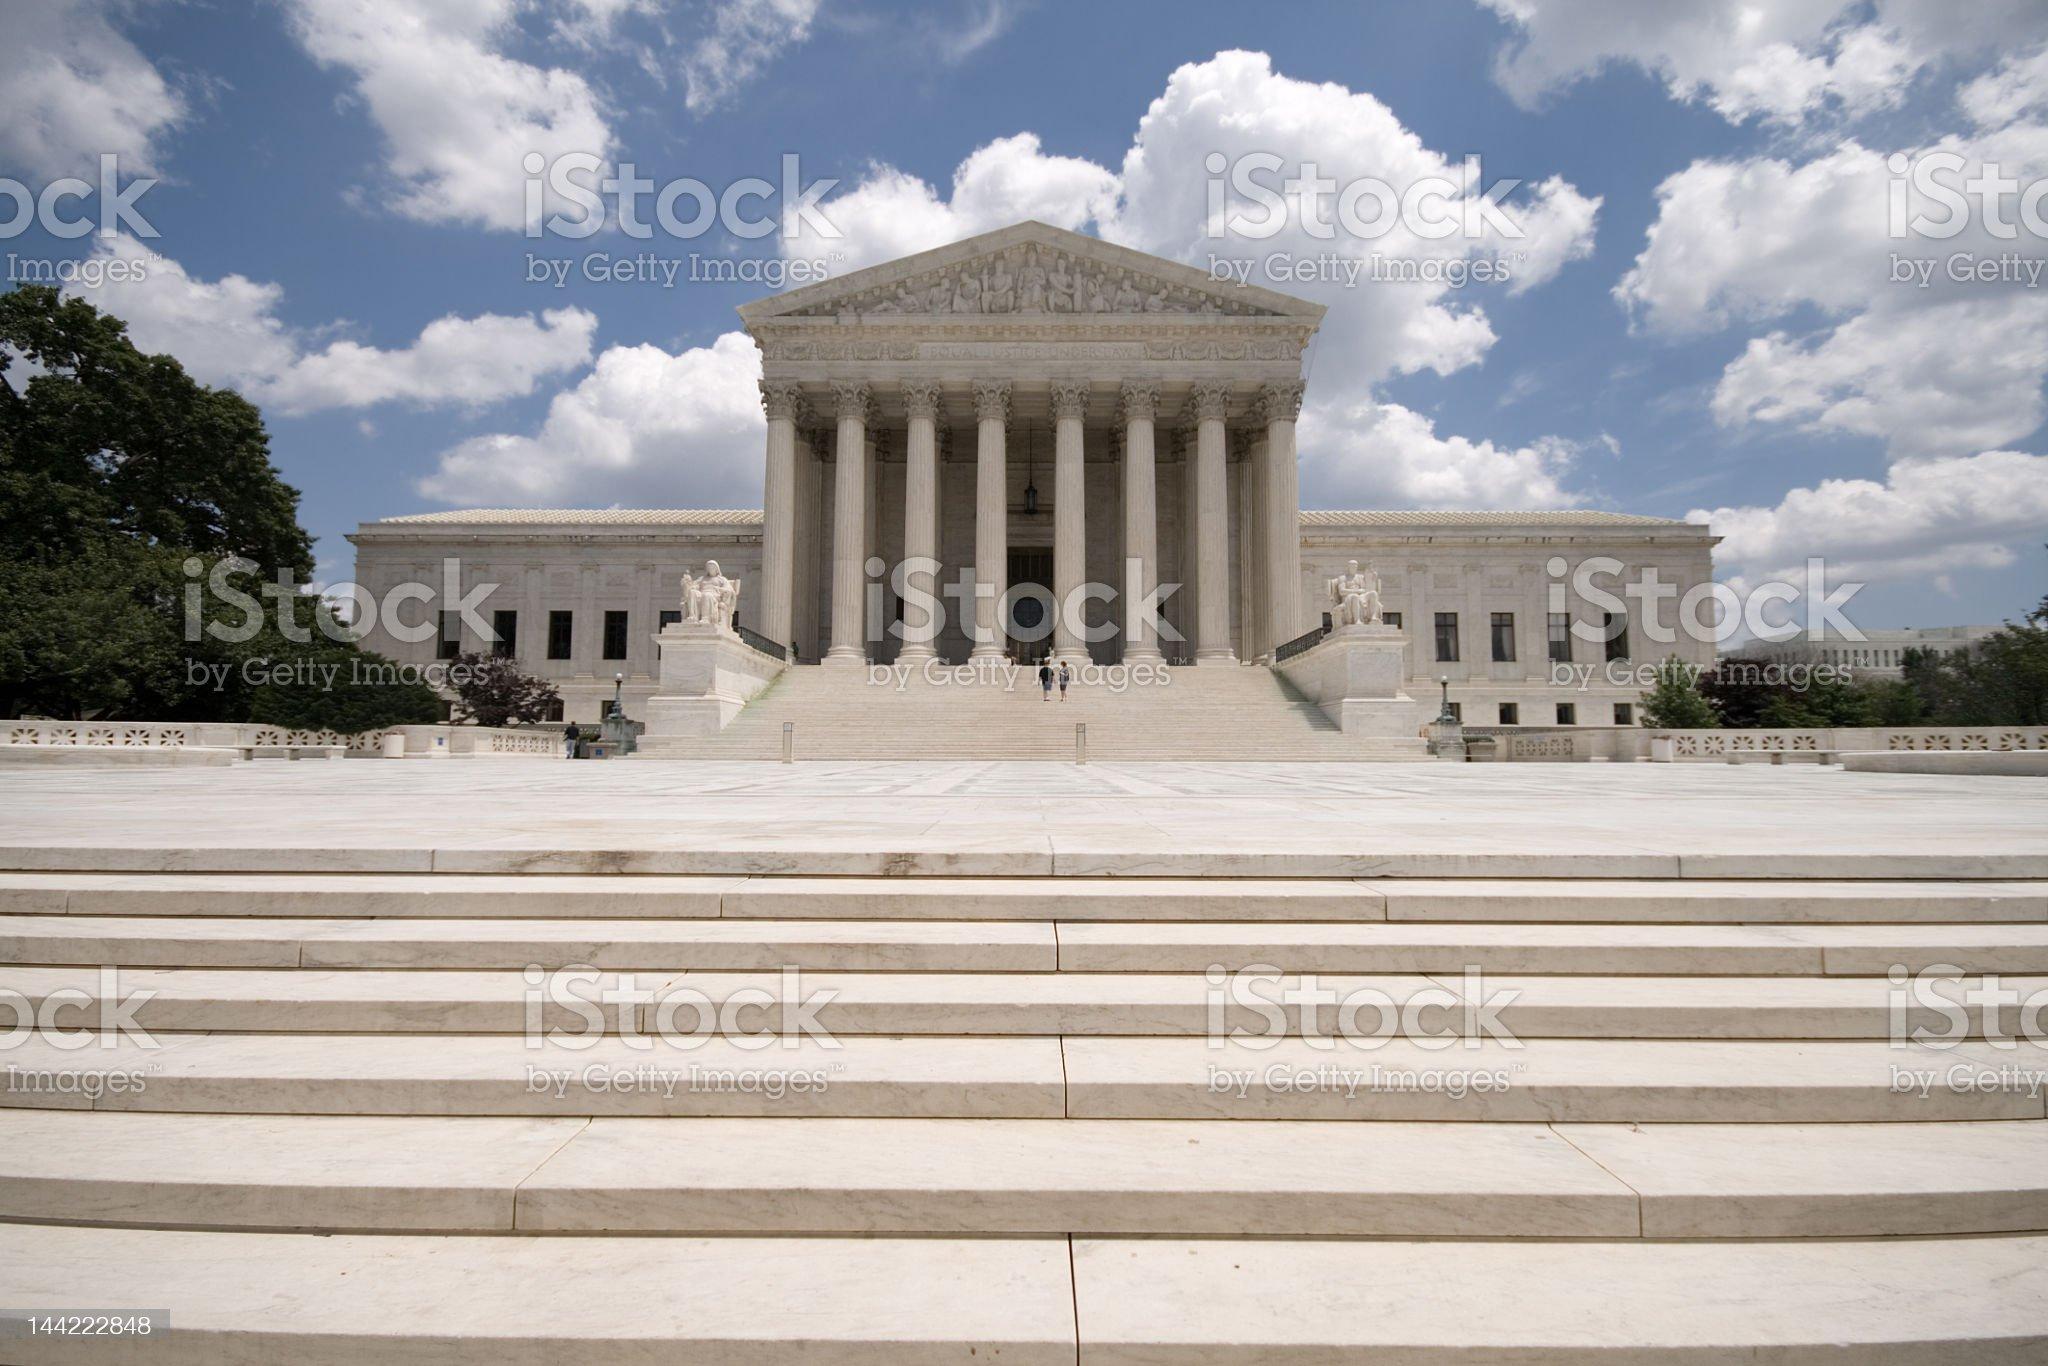 American Supreme Court Building, Washington DC, Blue Sky royalty-free stock photo